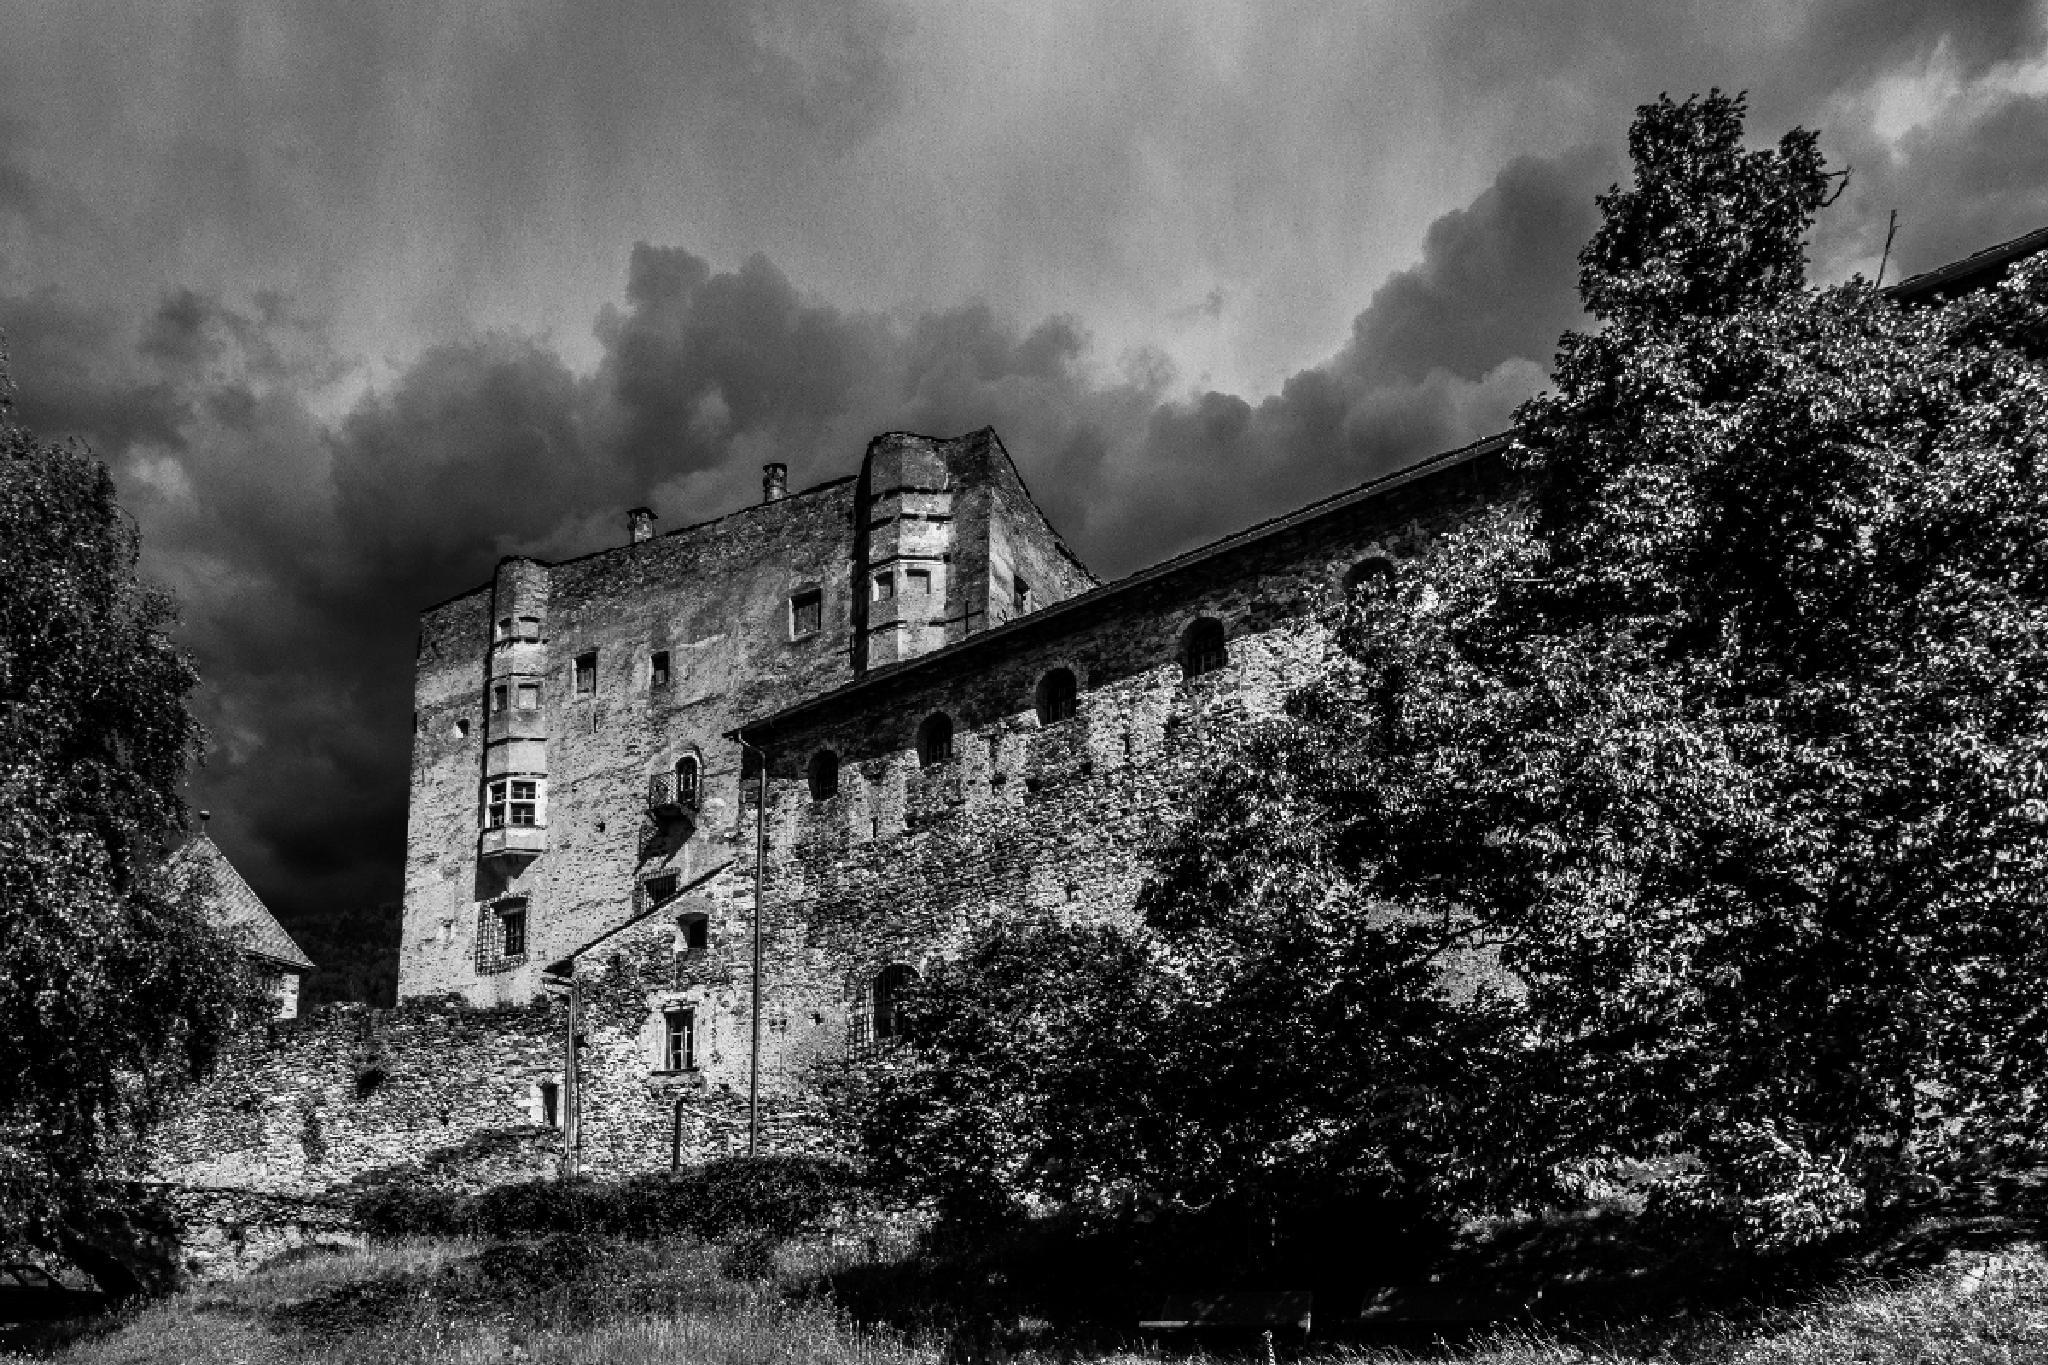 Castello Pergine Valsugana by FSFoto